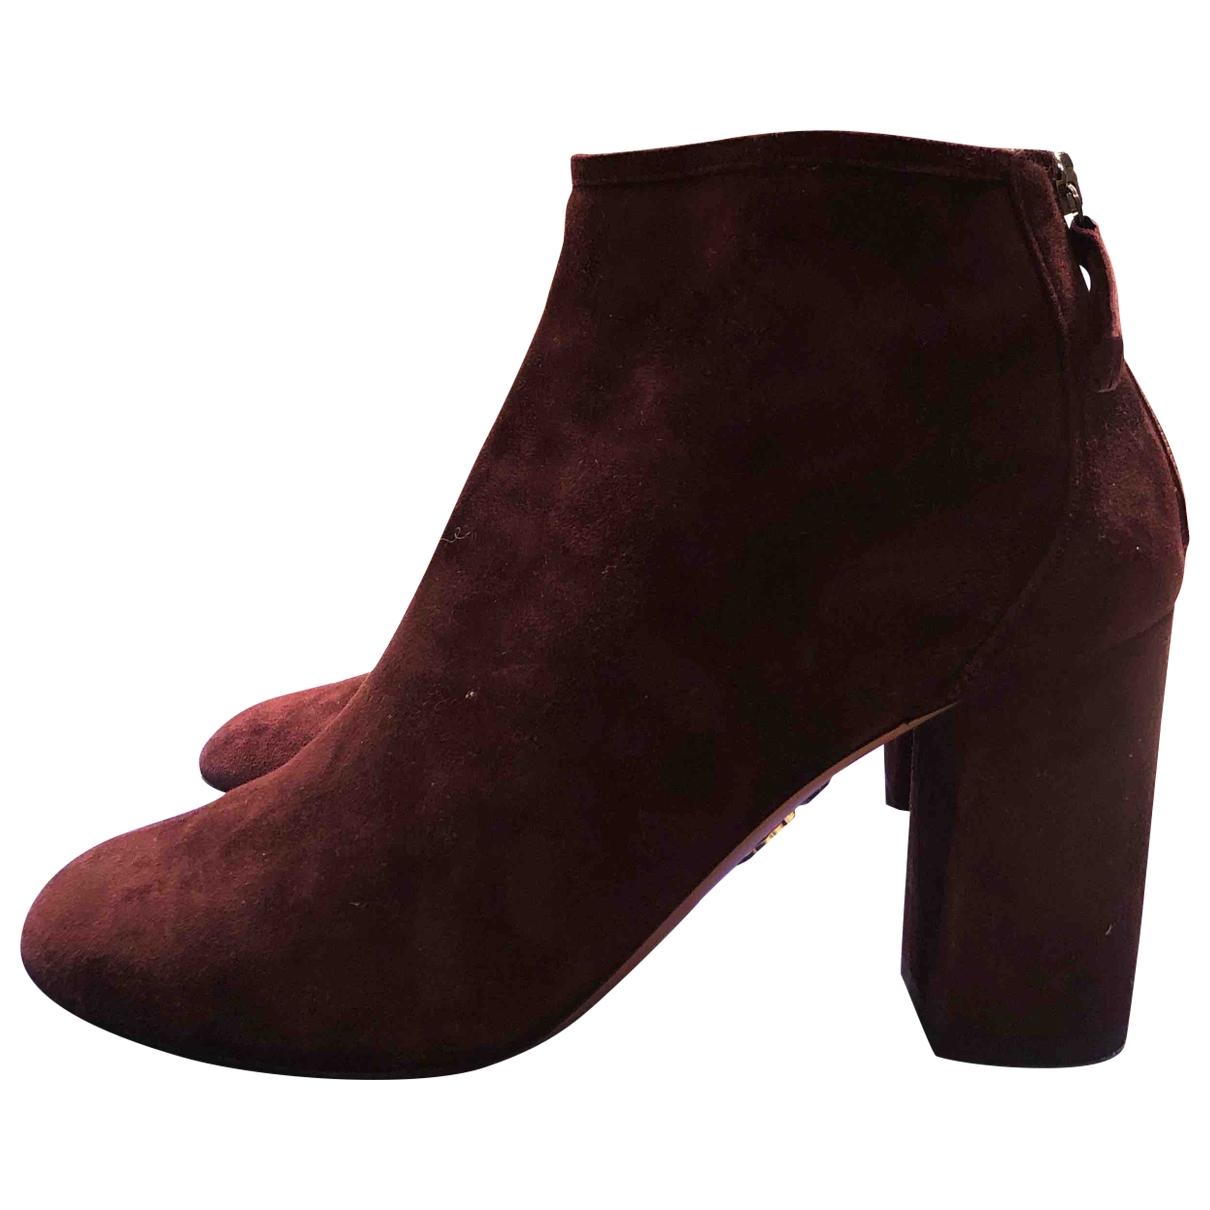 Aquazzura \N Leather Boots for Women 36 EU